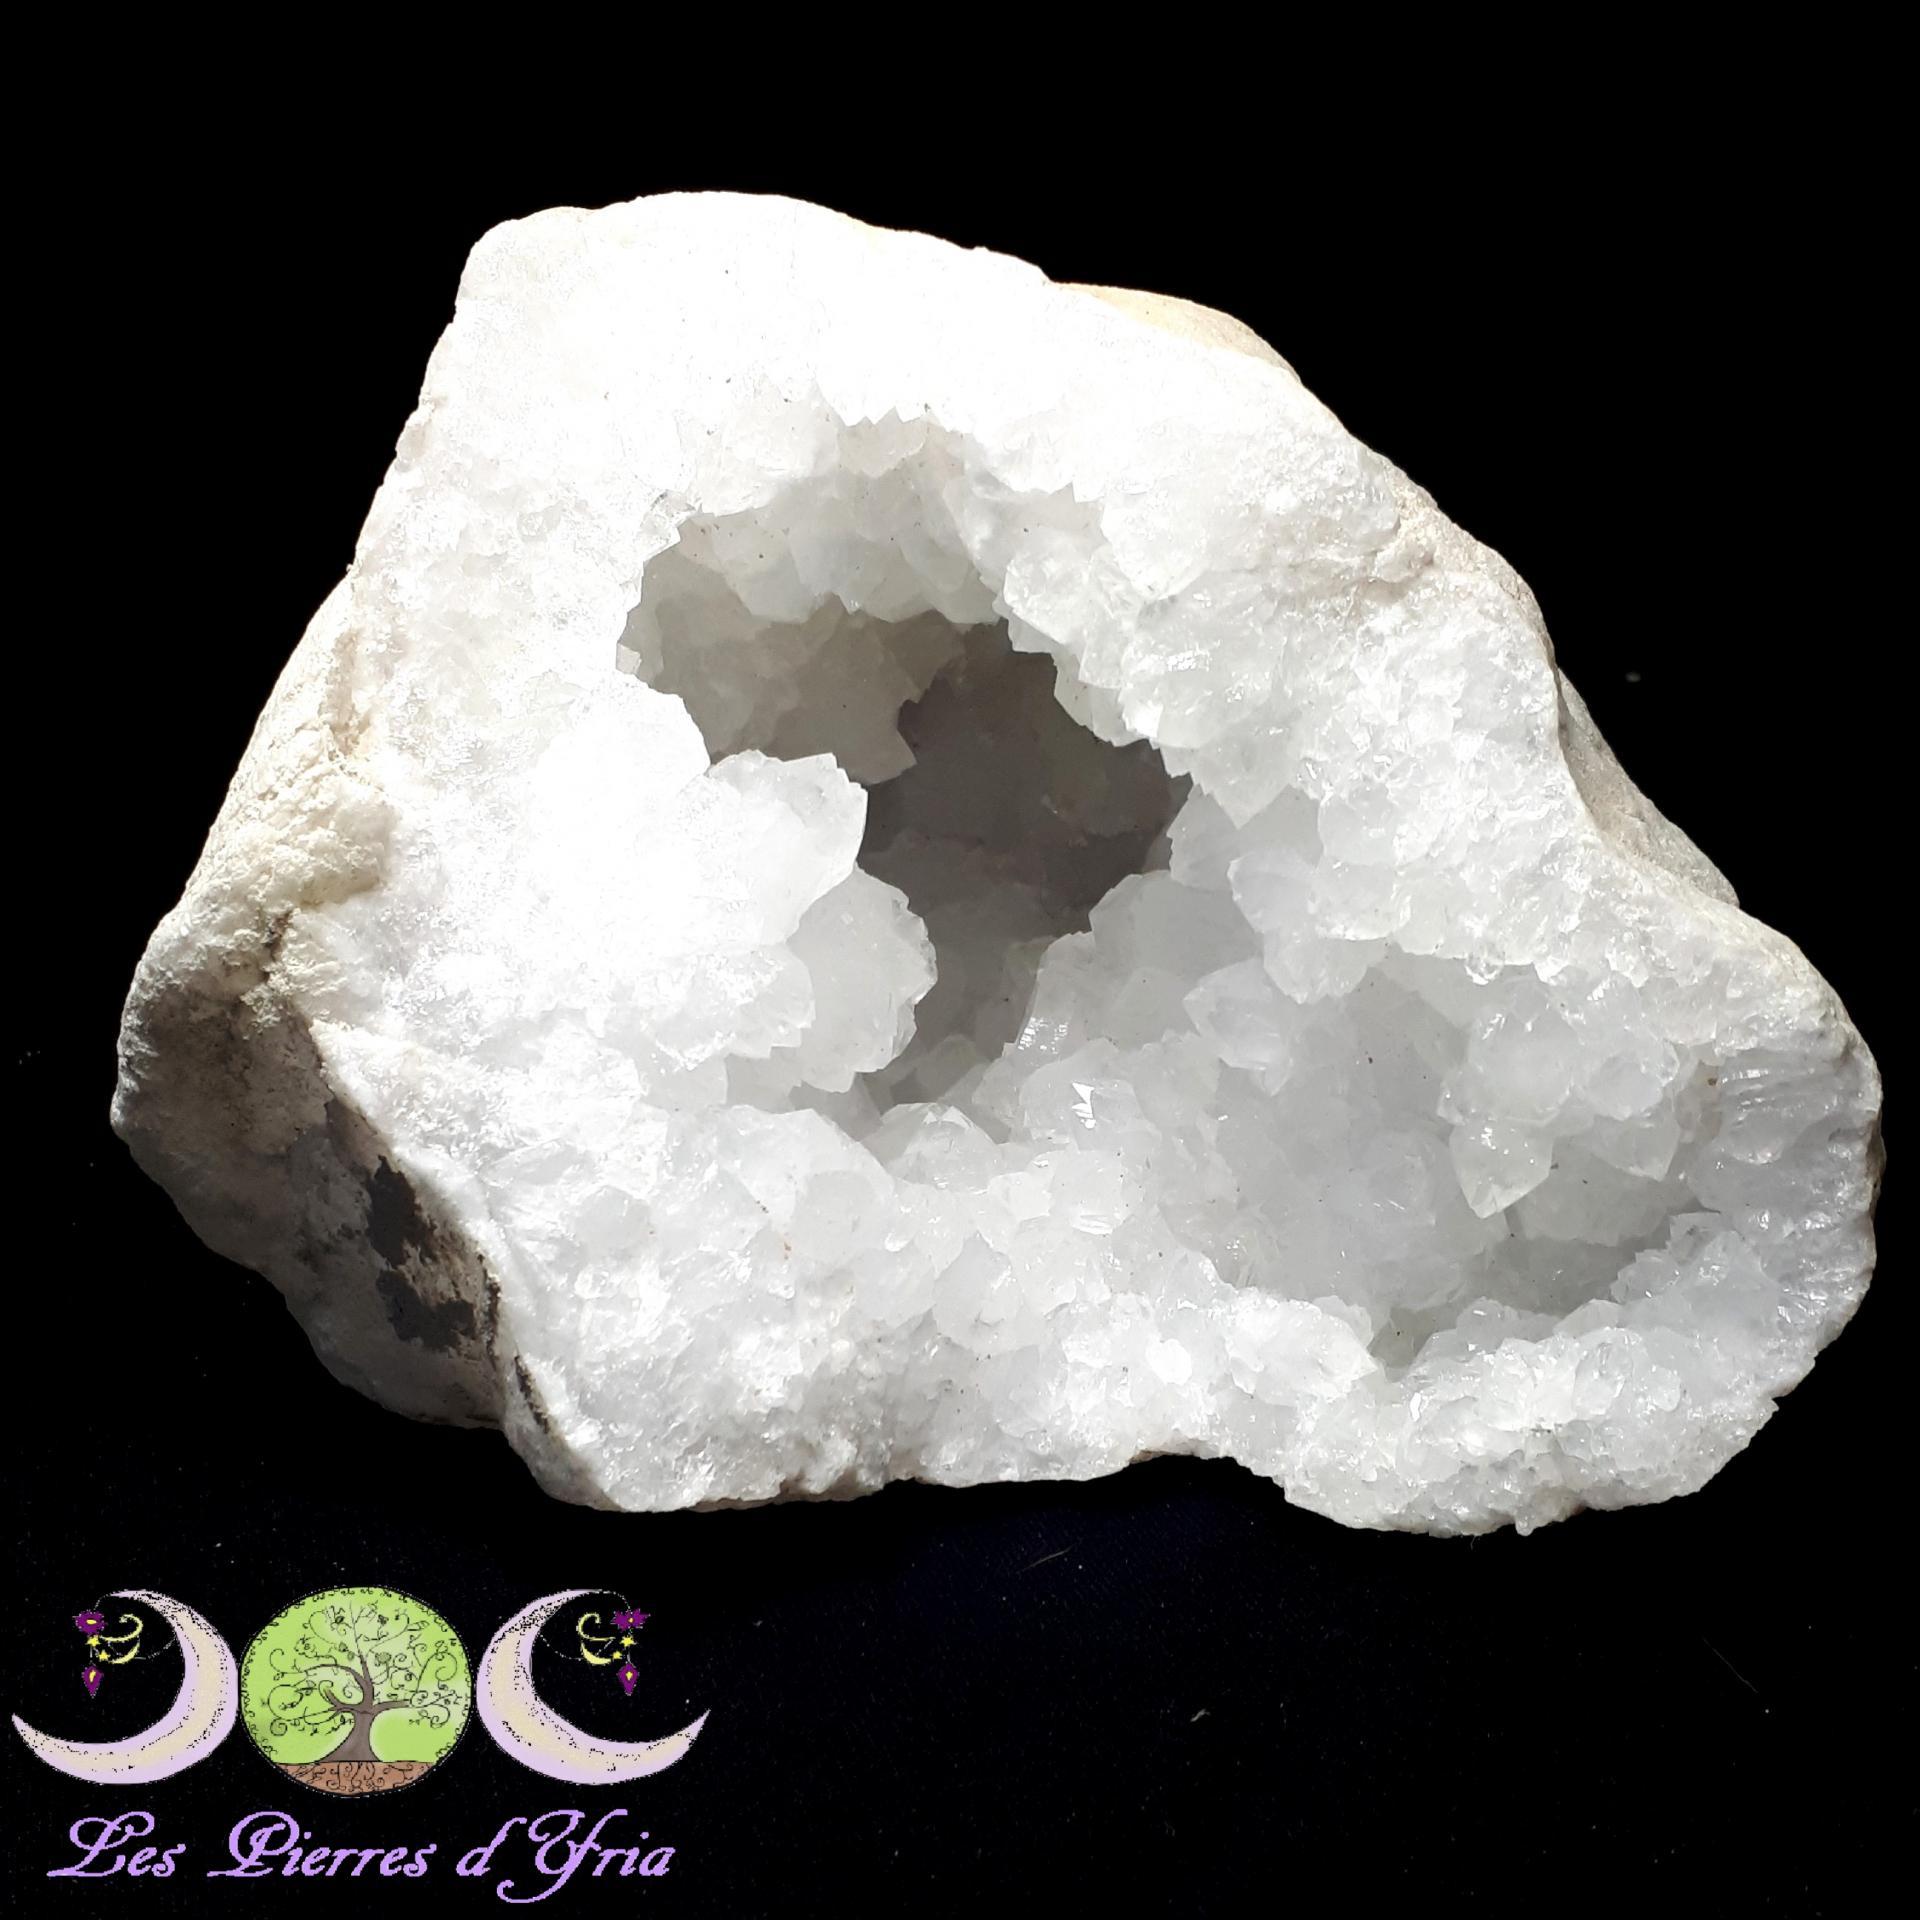 Geode cdr 26 gf